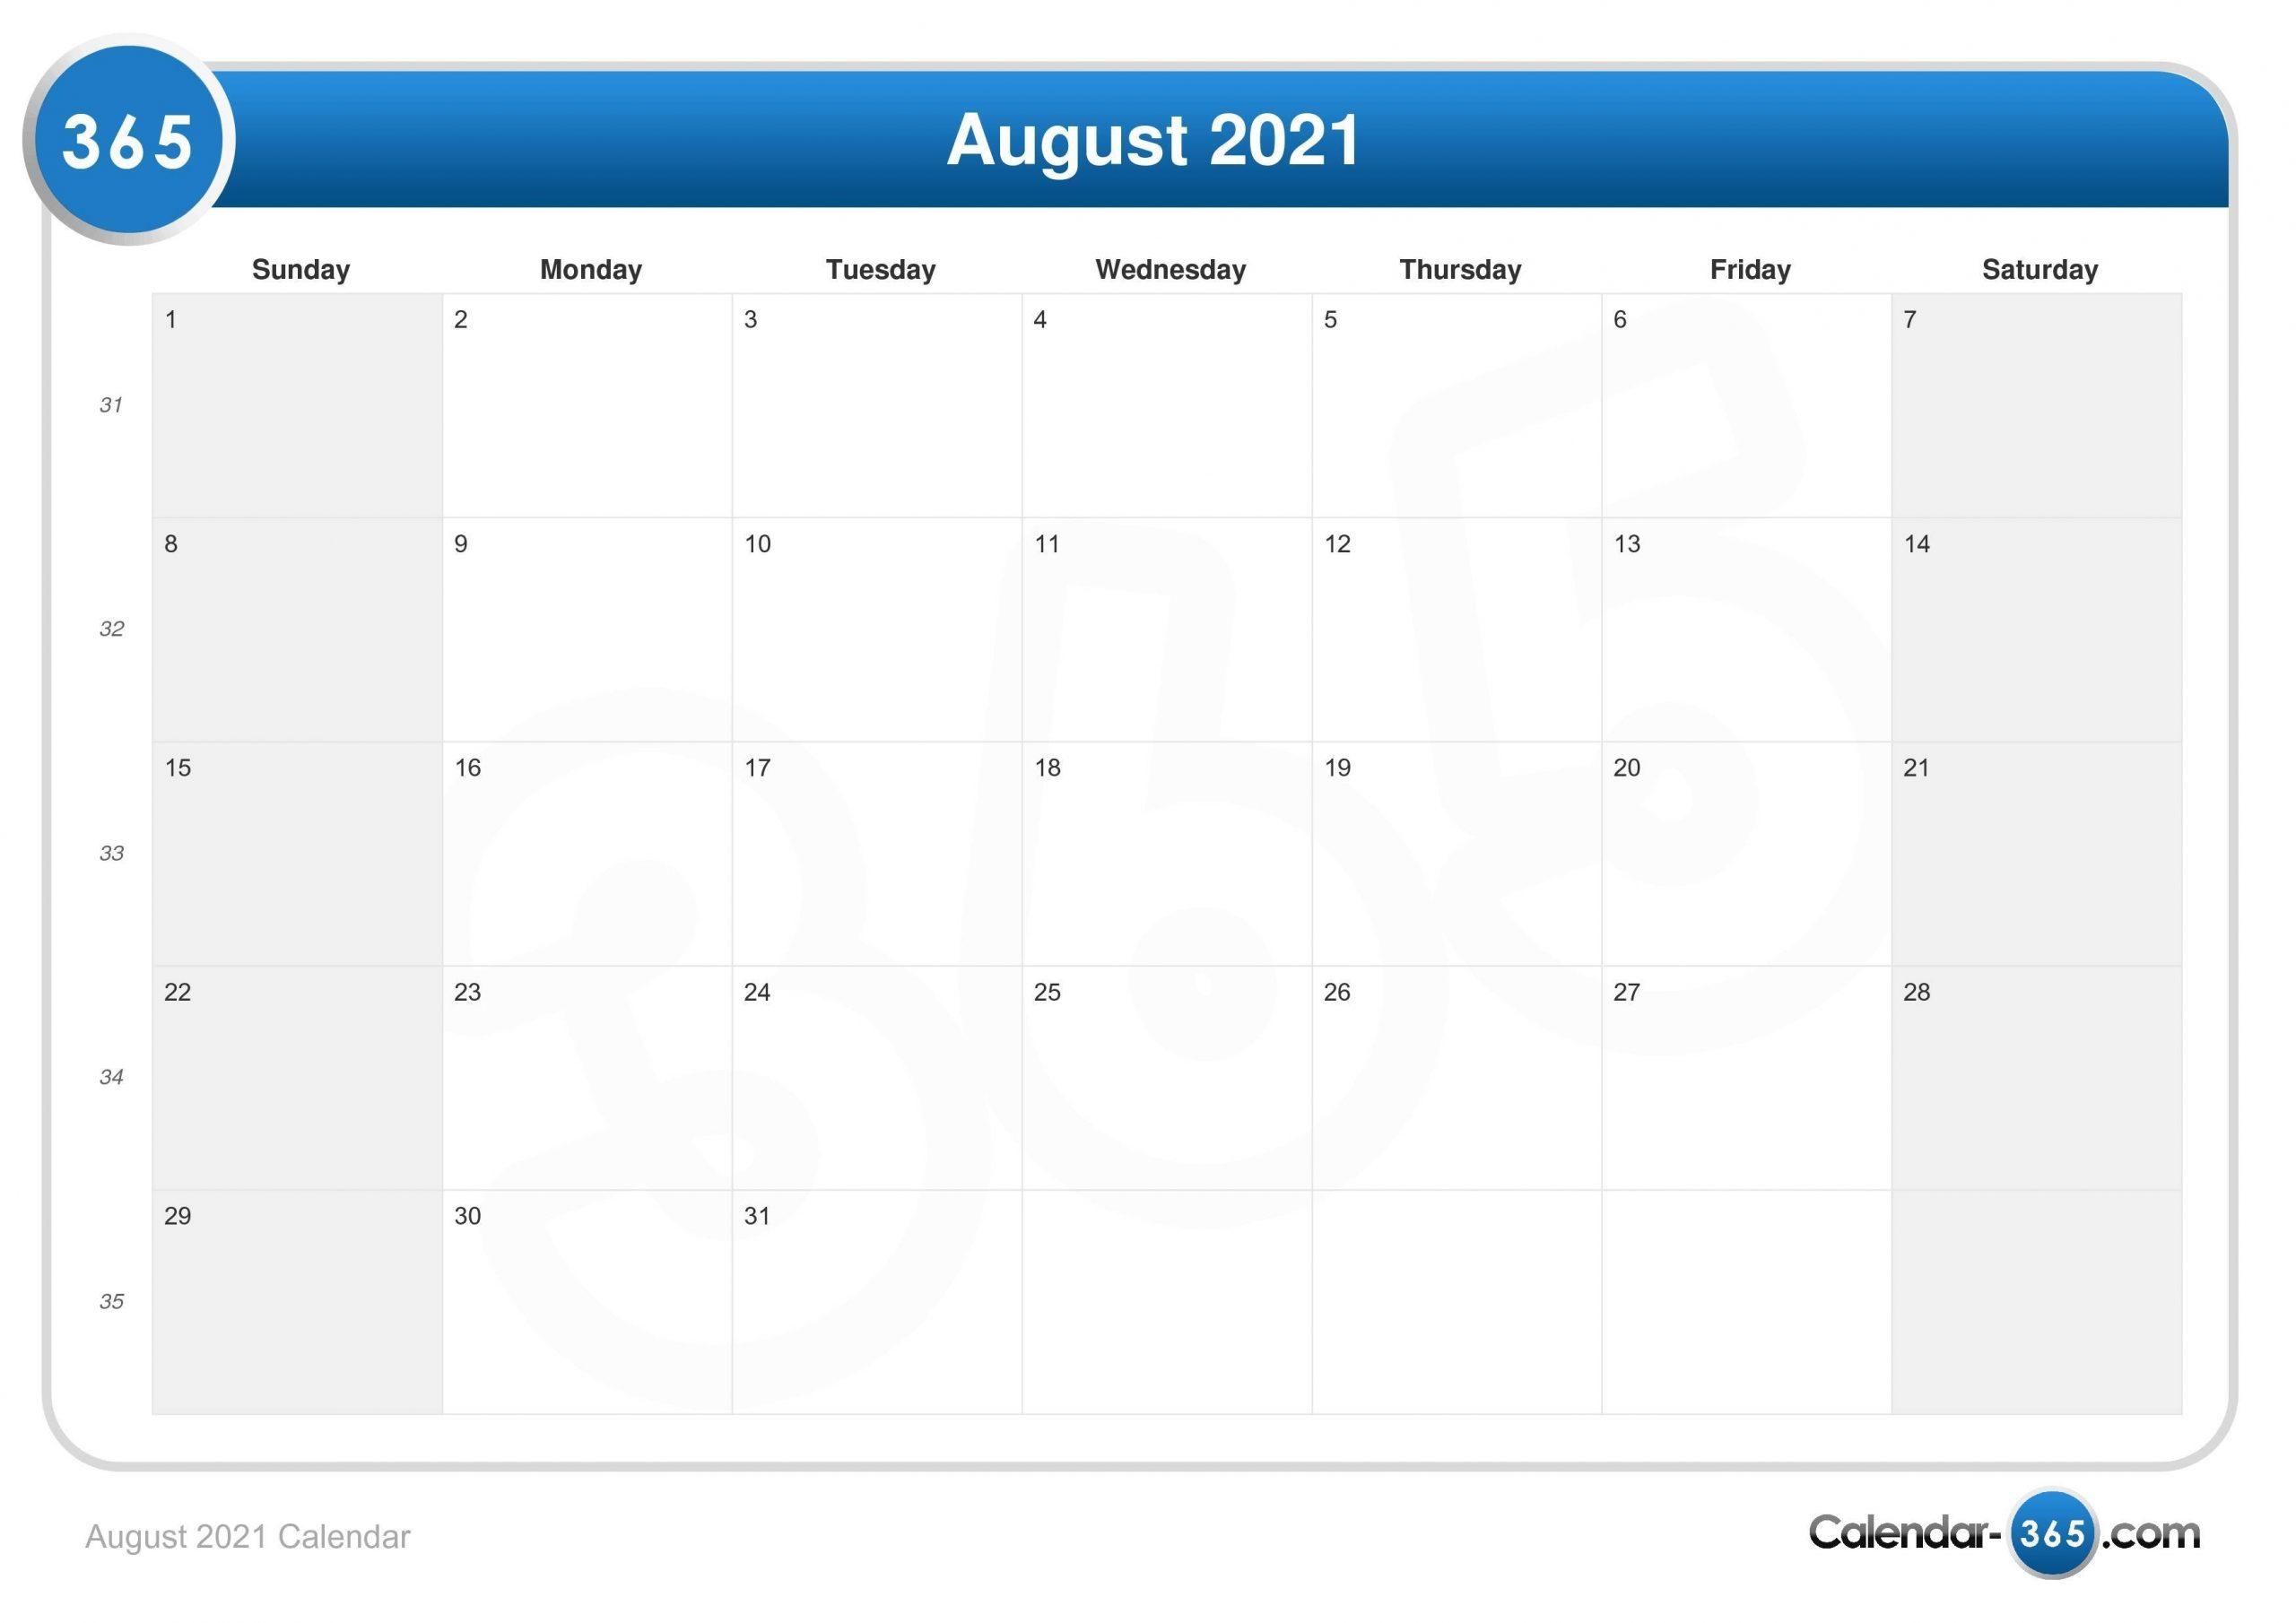 Take Calendar August 2021